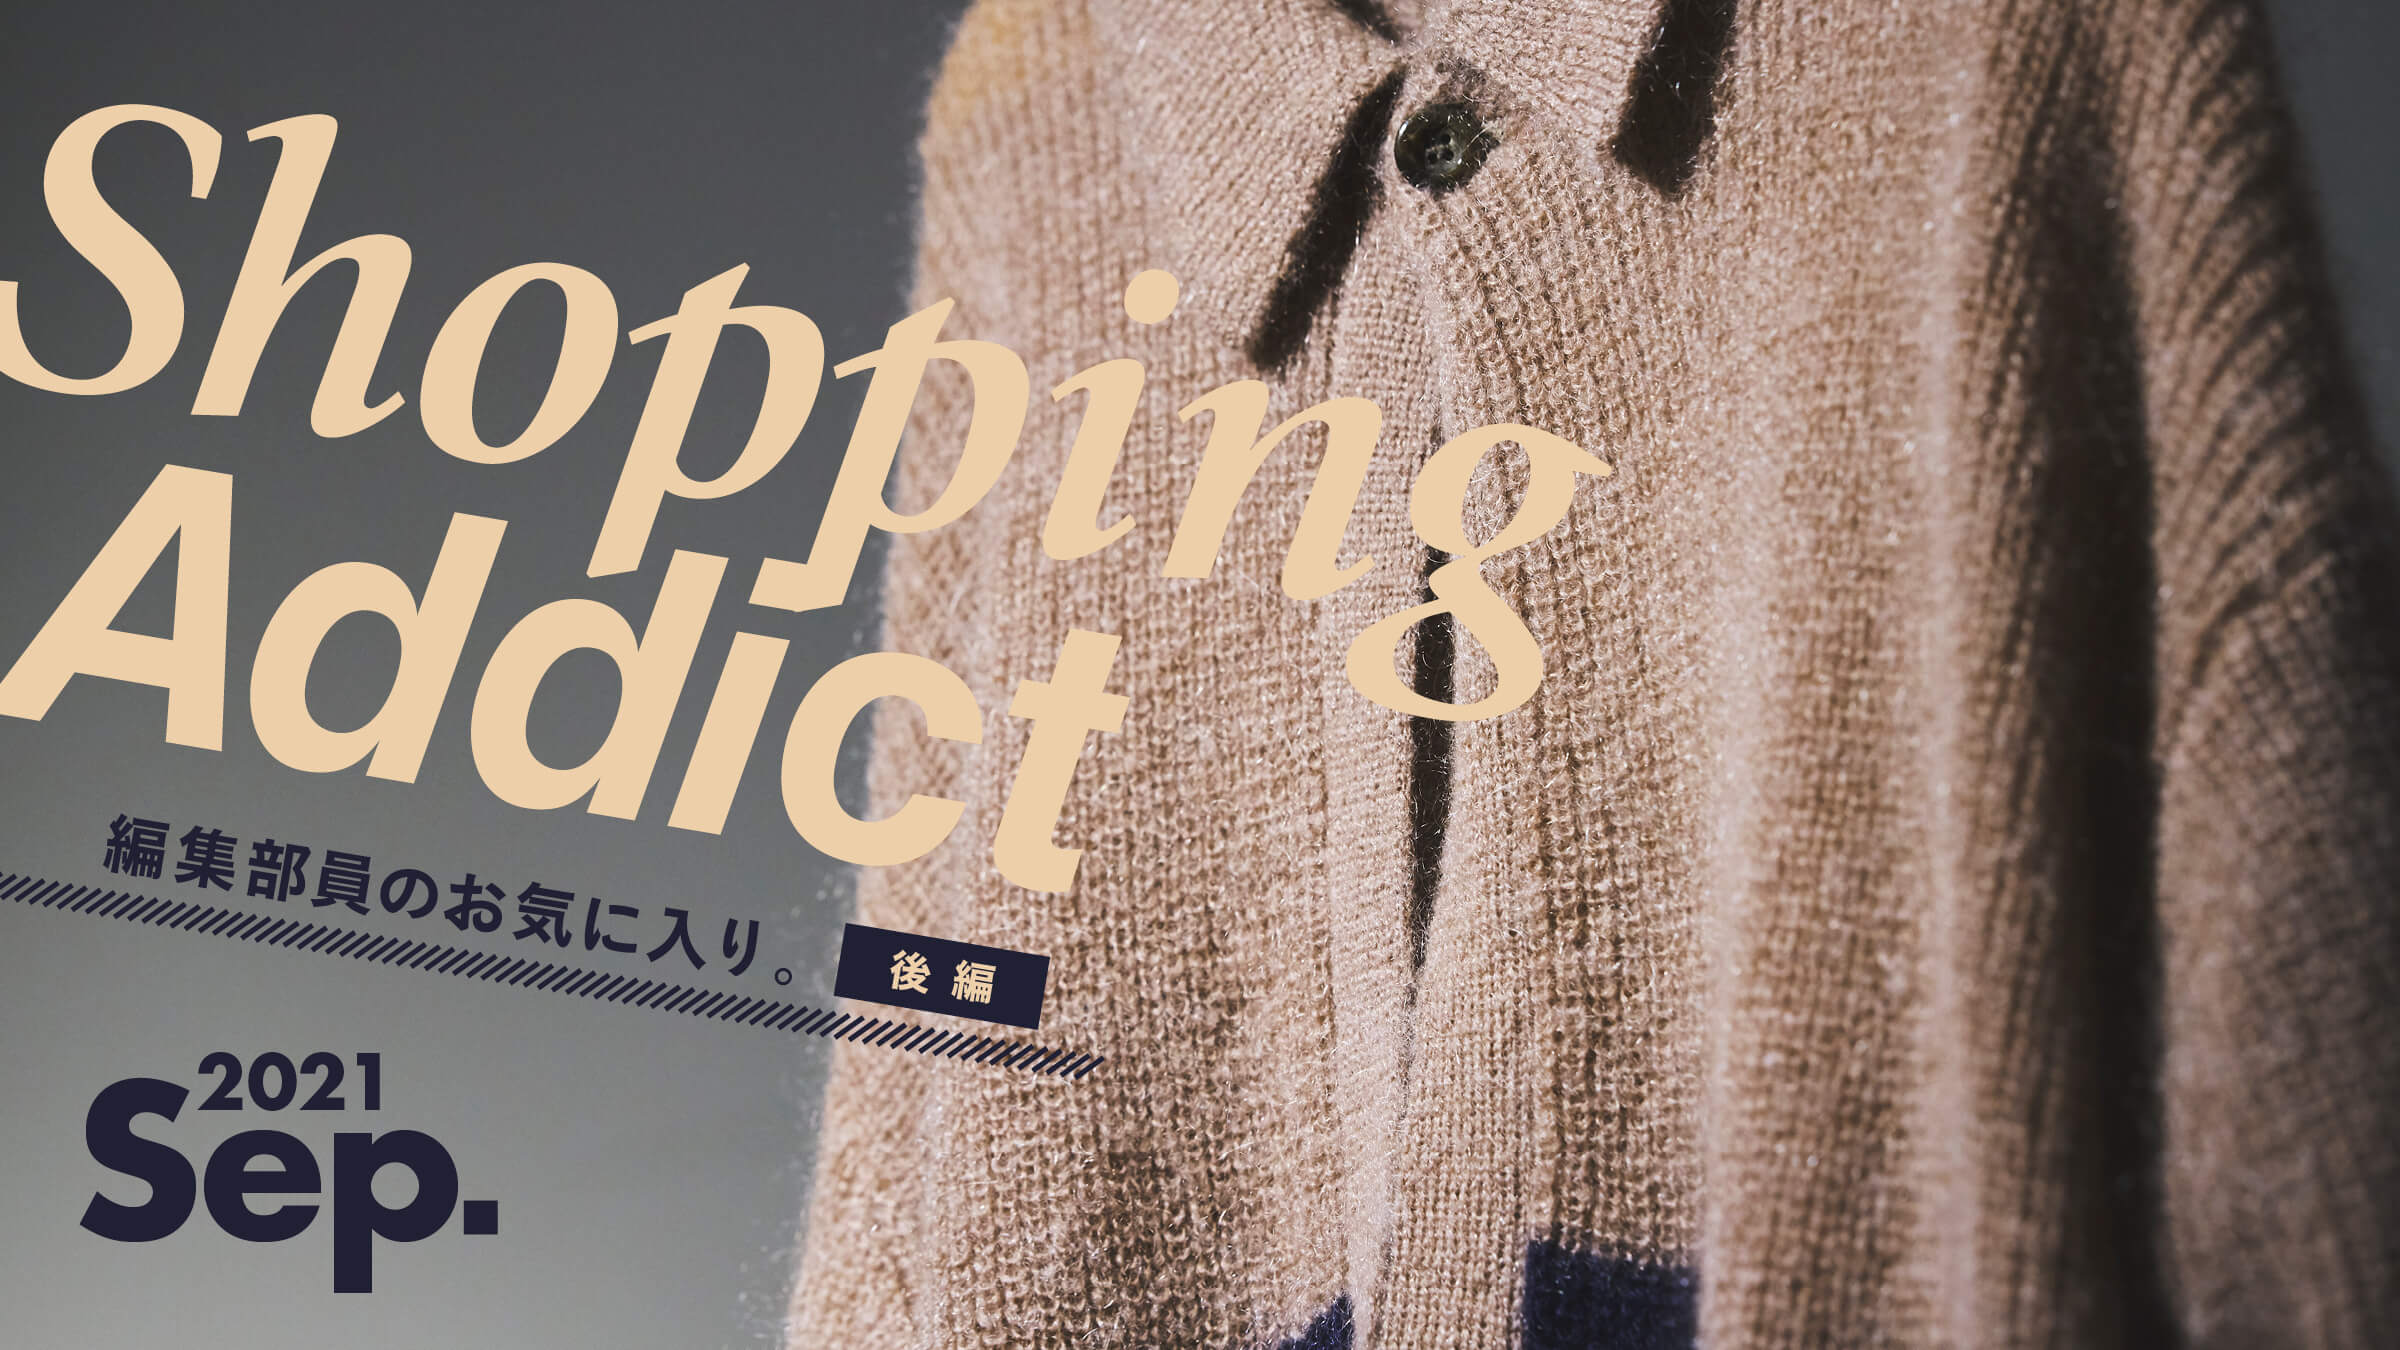 Shopping Addict 2021 Sept. 〜編集部員のお気に入り〜 後編